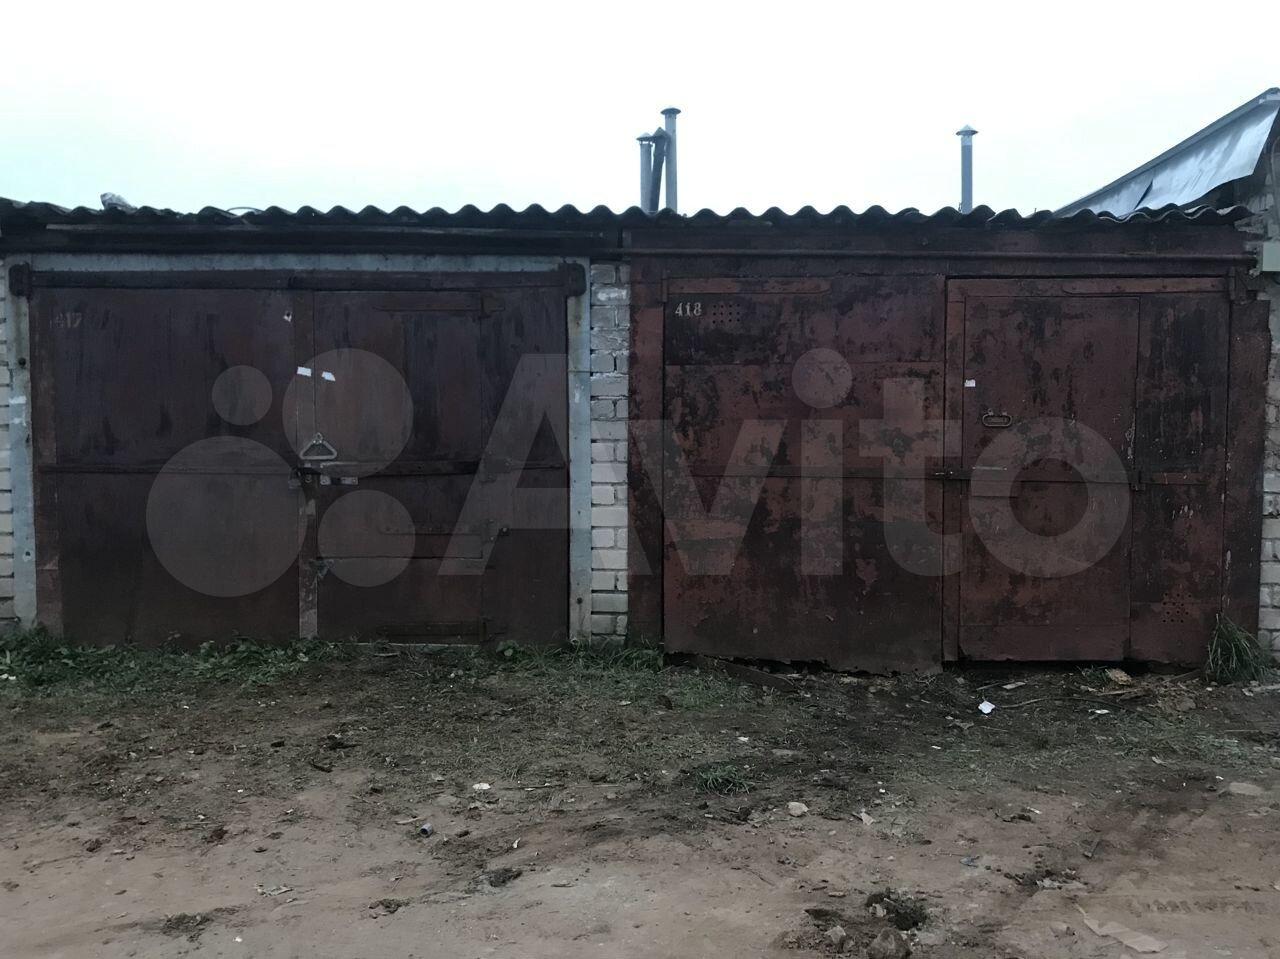 30 m2 in Kirov> Garage, > 30 m2  89253582004 buy 2